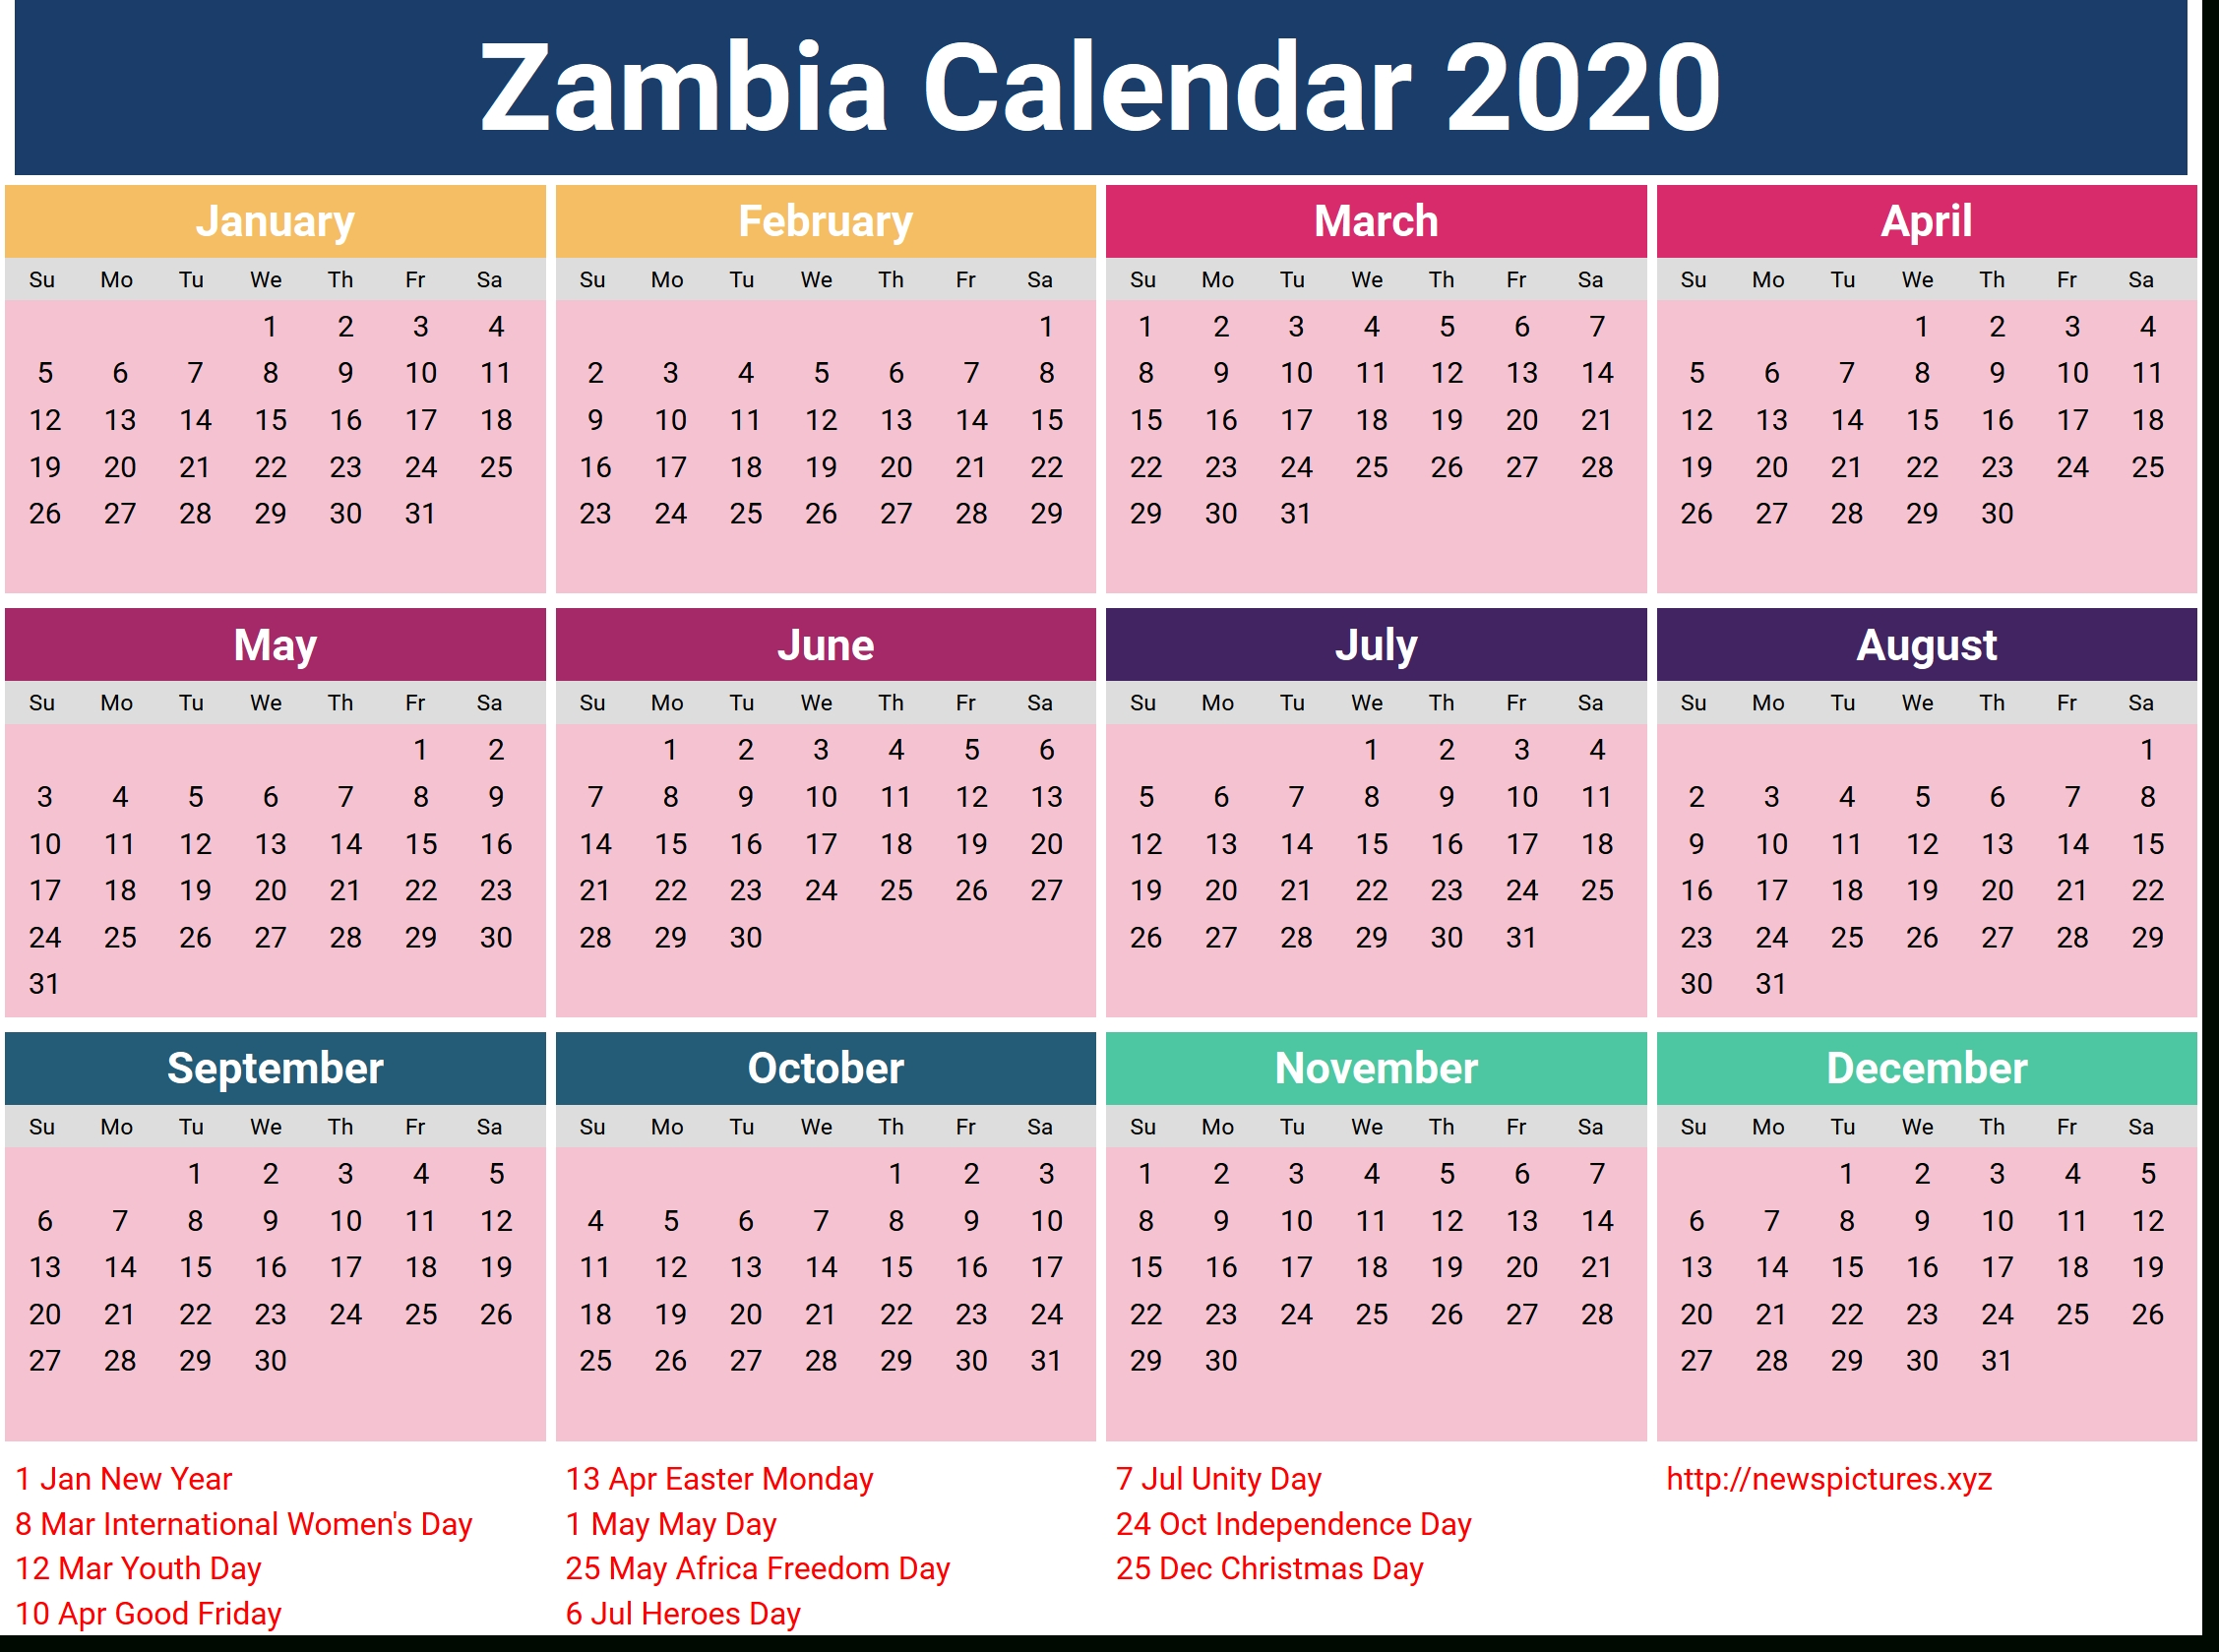 2020 Zambian Calendar | Print Calendar Page